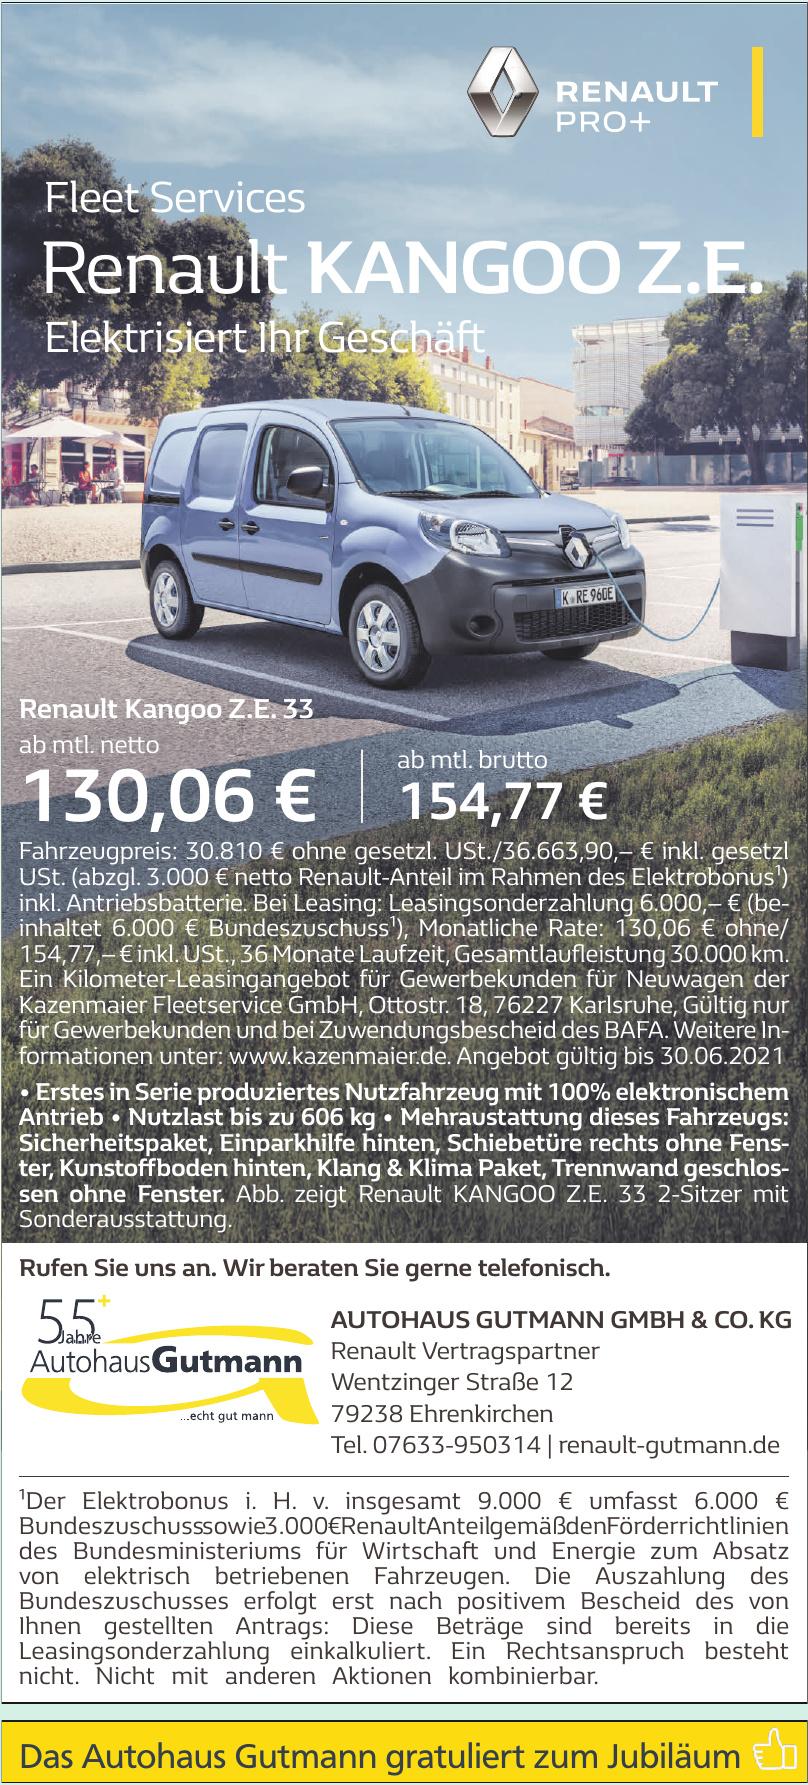 Autohaus Gutmann GmbH & Co.KG